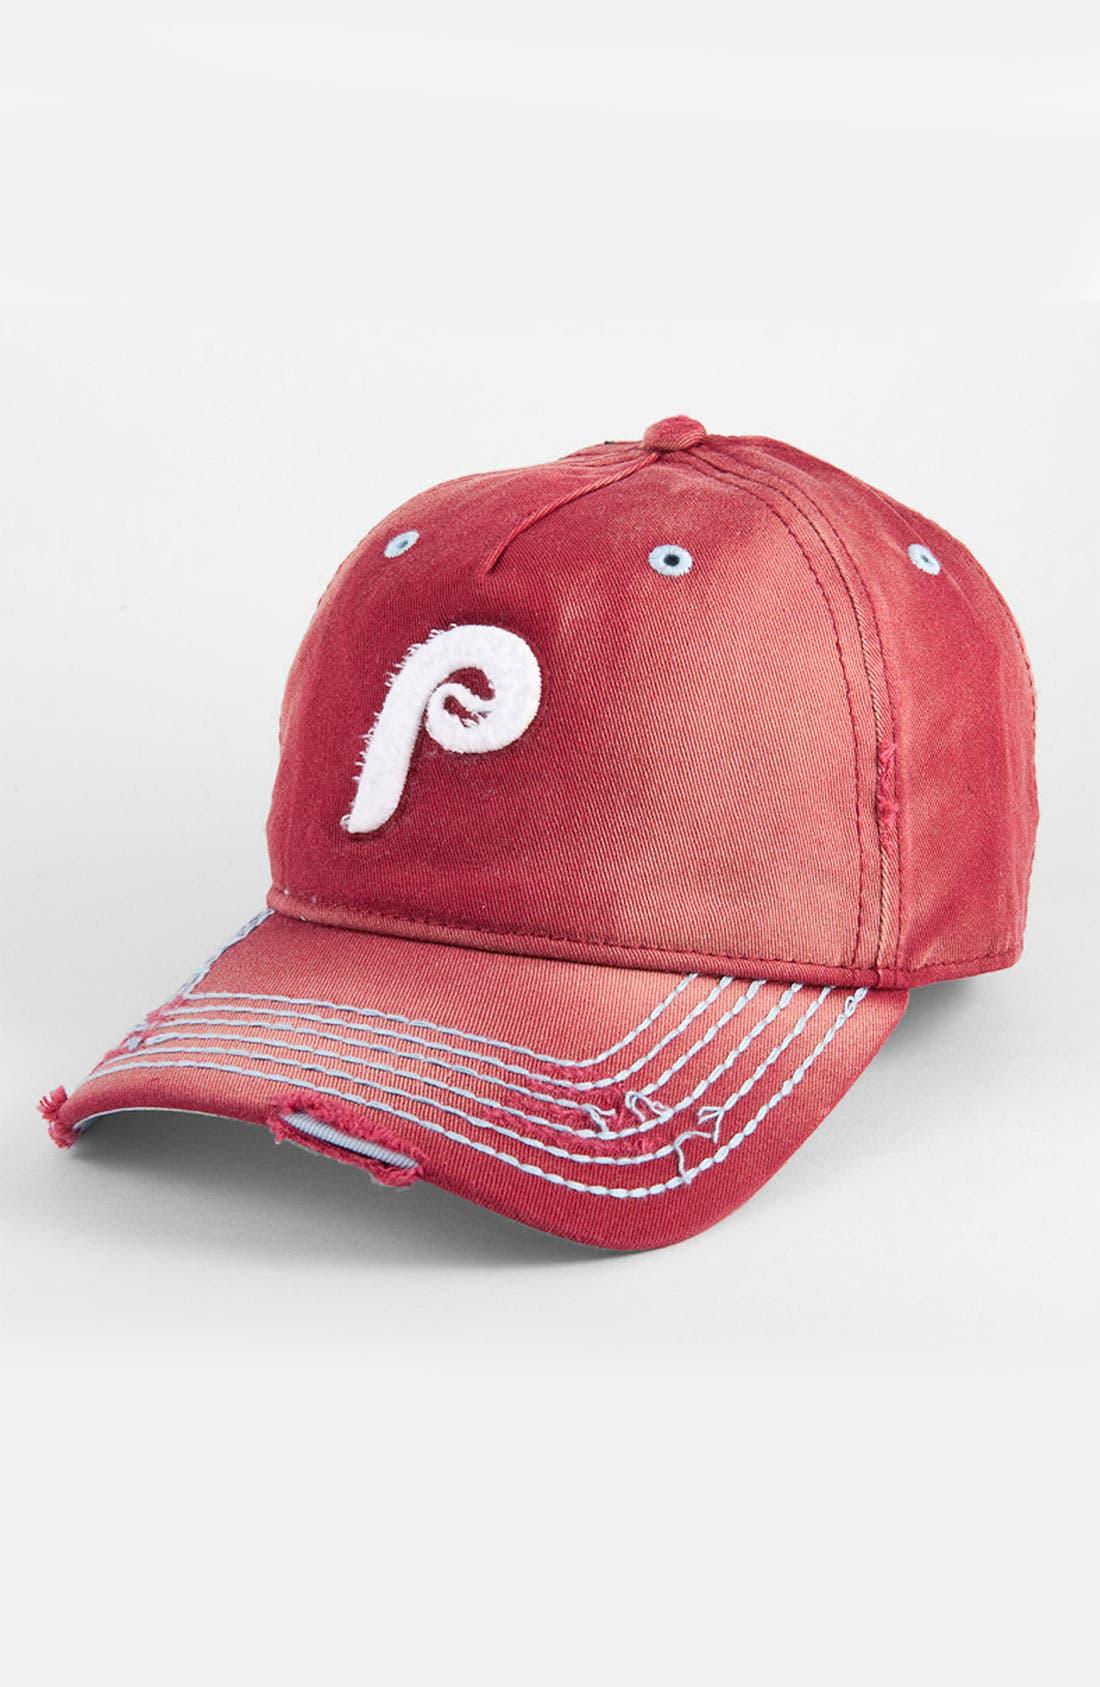 Alternate Image 1 Selected - American Needle 'Phillies' Baseball Cap